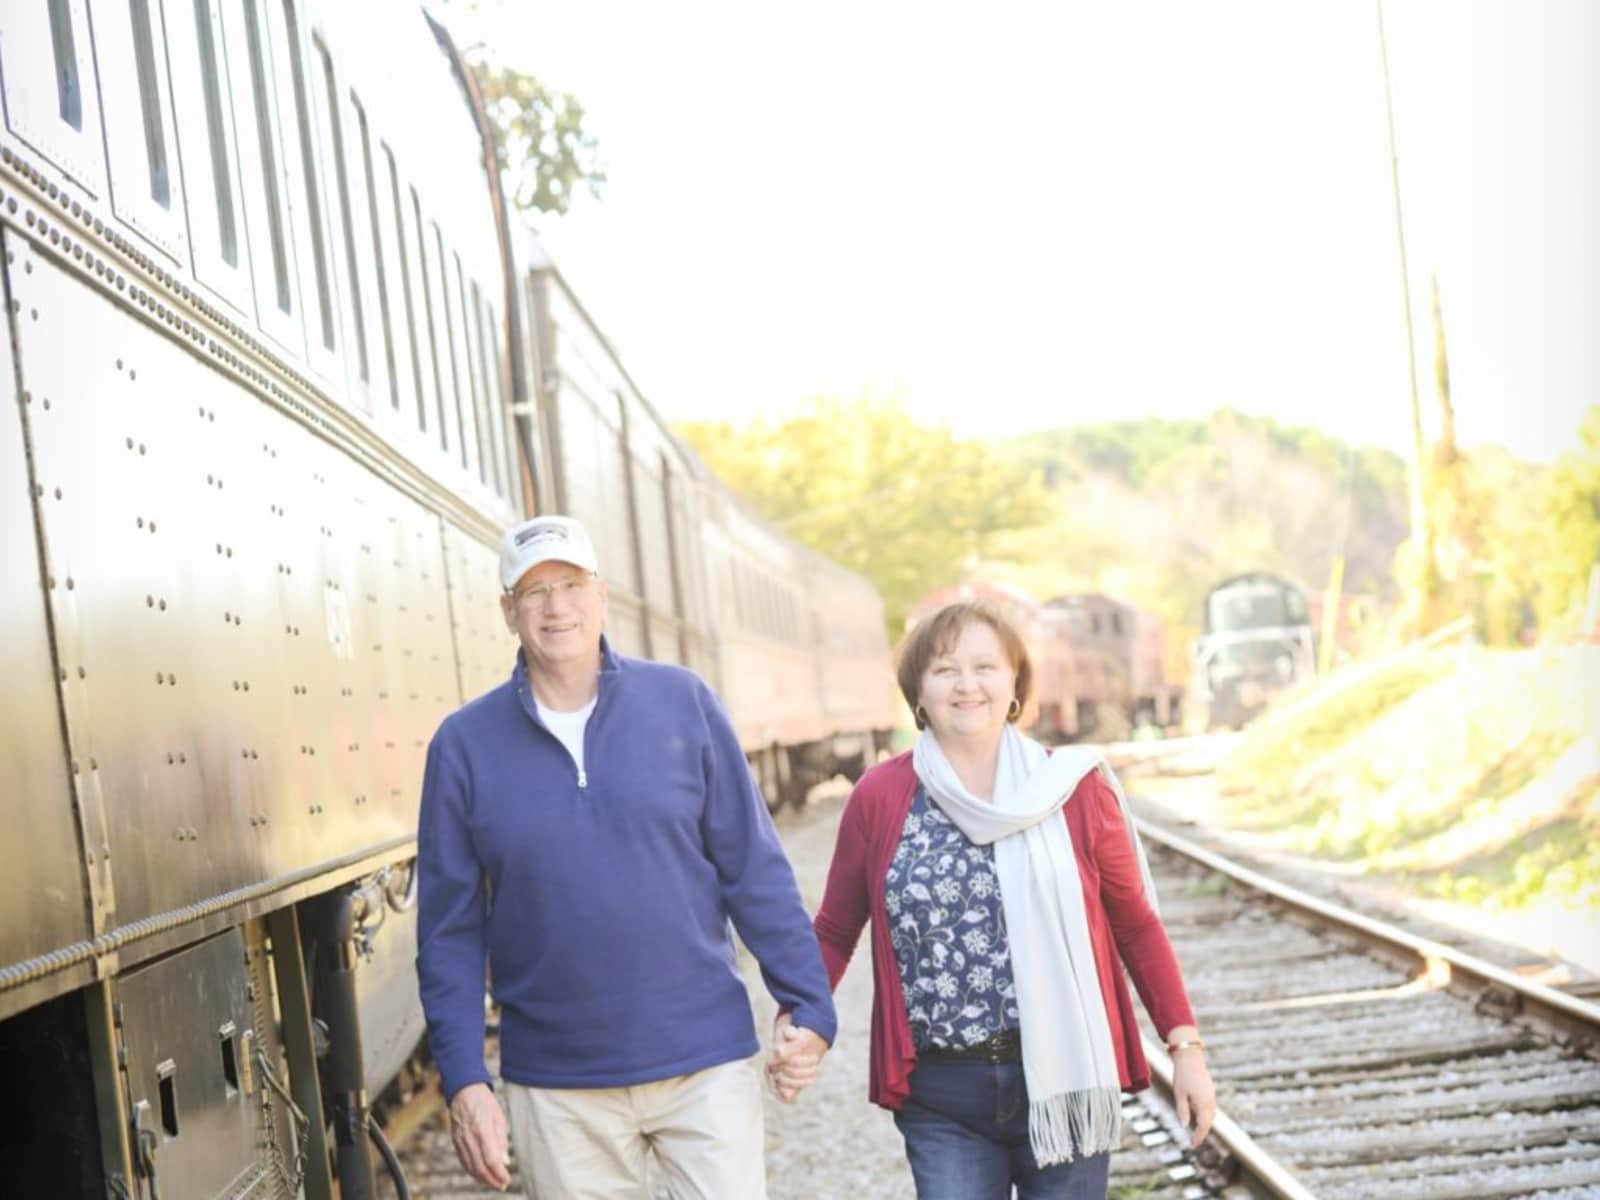 Debbie & steve & Steve from Huntsville, Alabama, United States